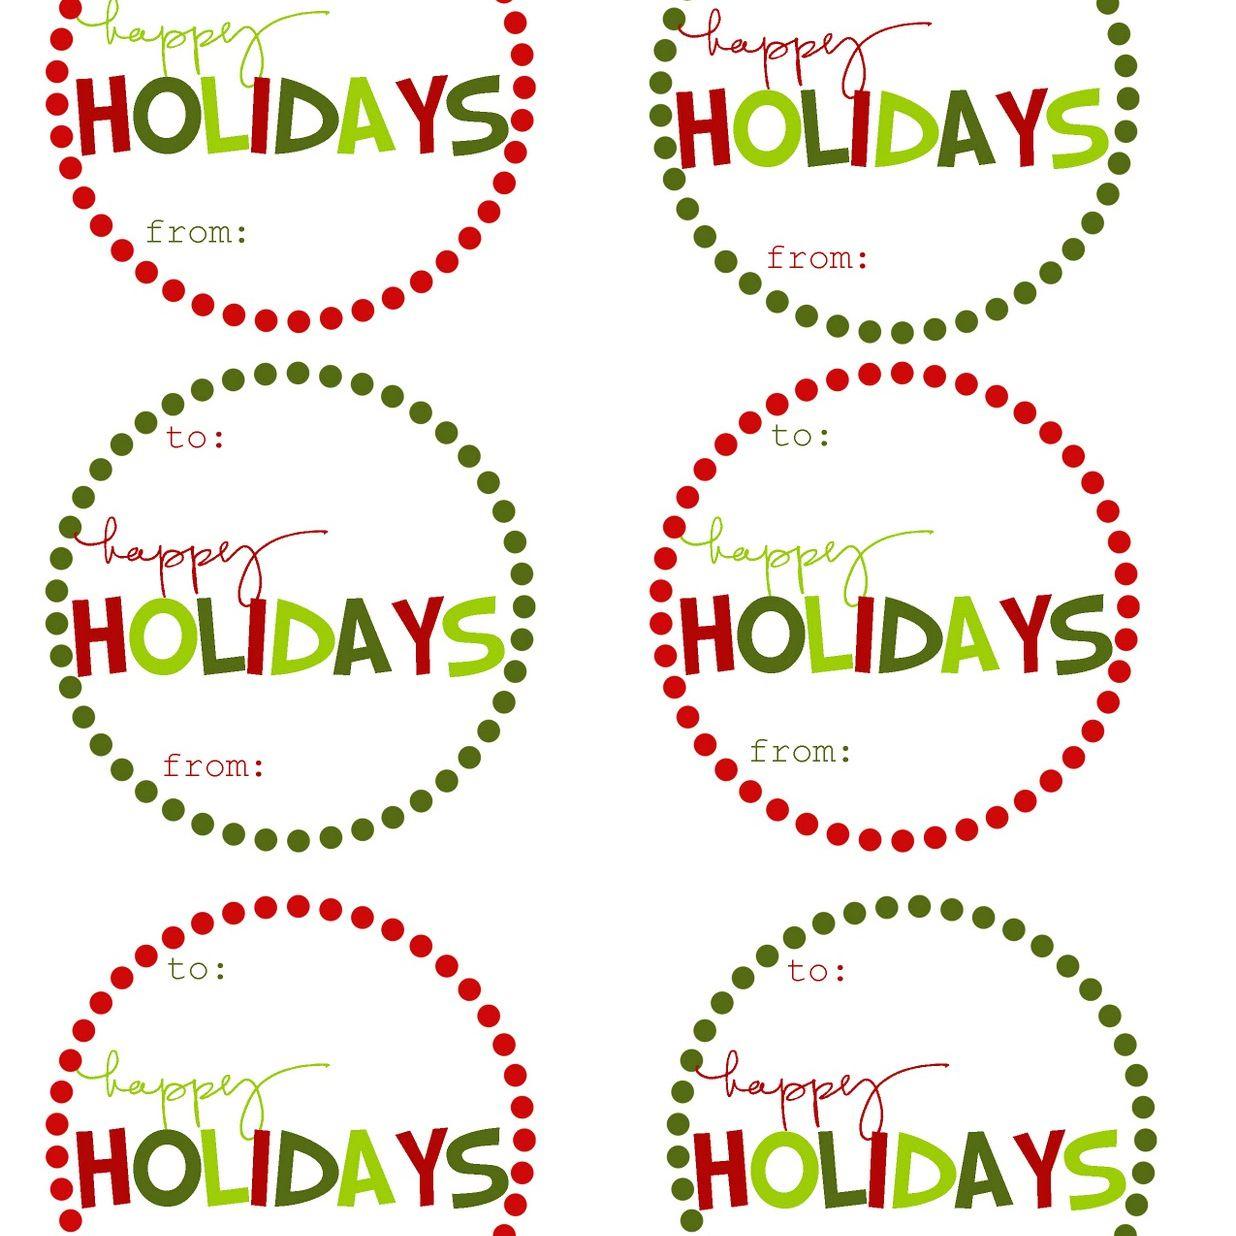 40 Sets Of Free Printable Christmas Gift Tags - Free Printable Holiday Stickers